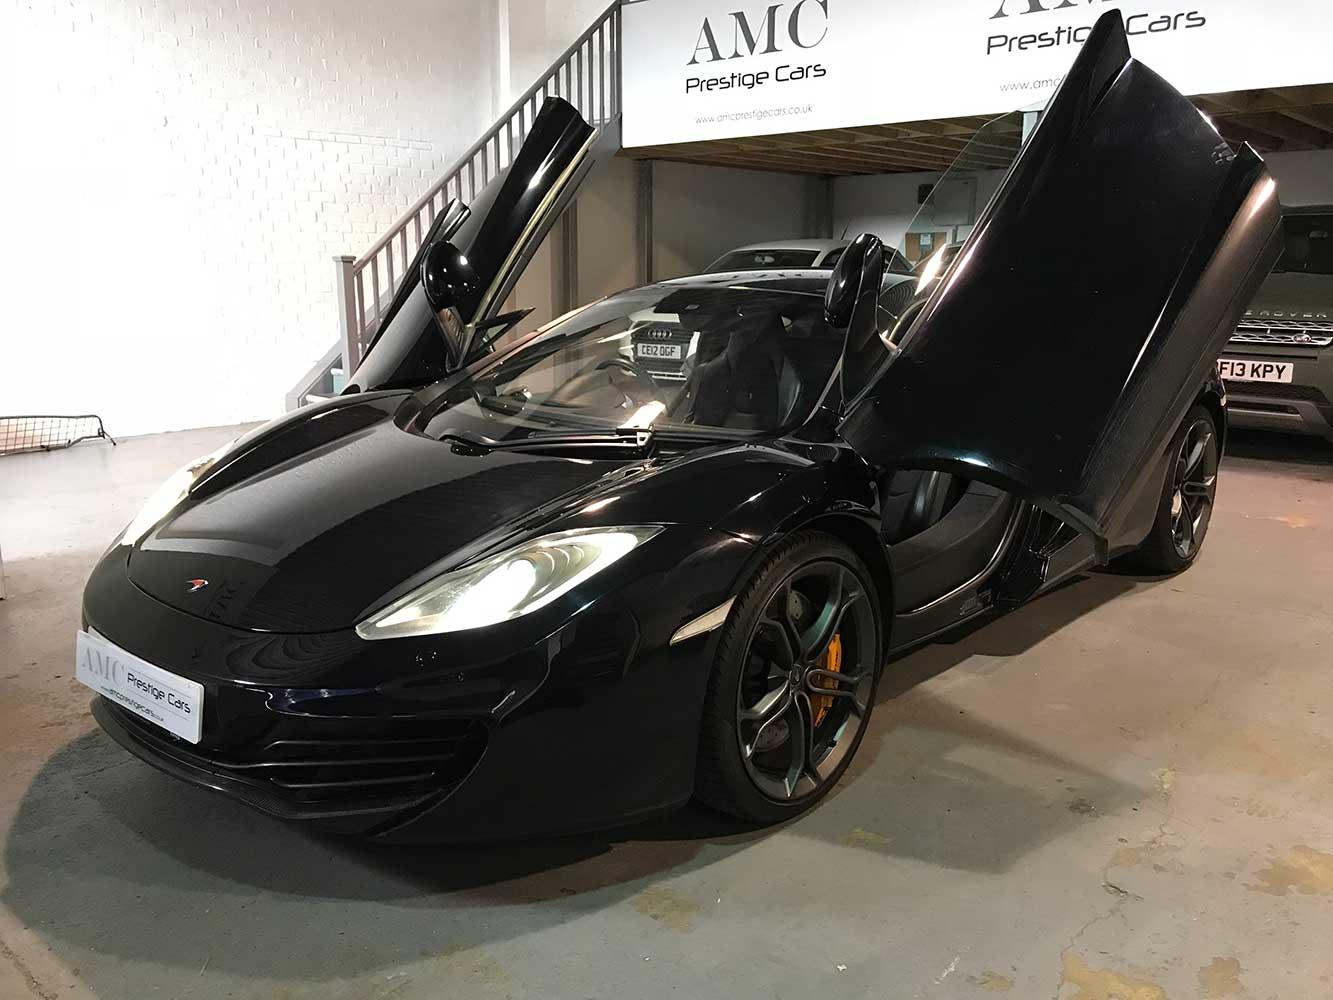 amc-prestige-cars